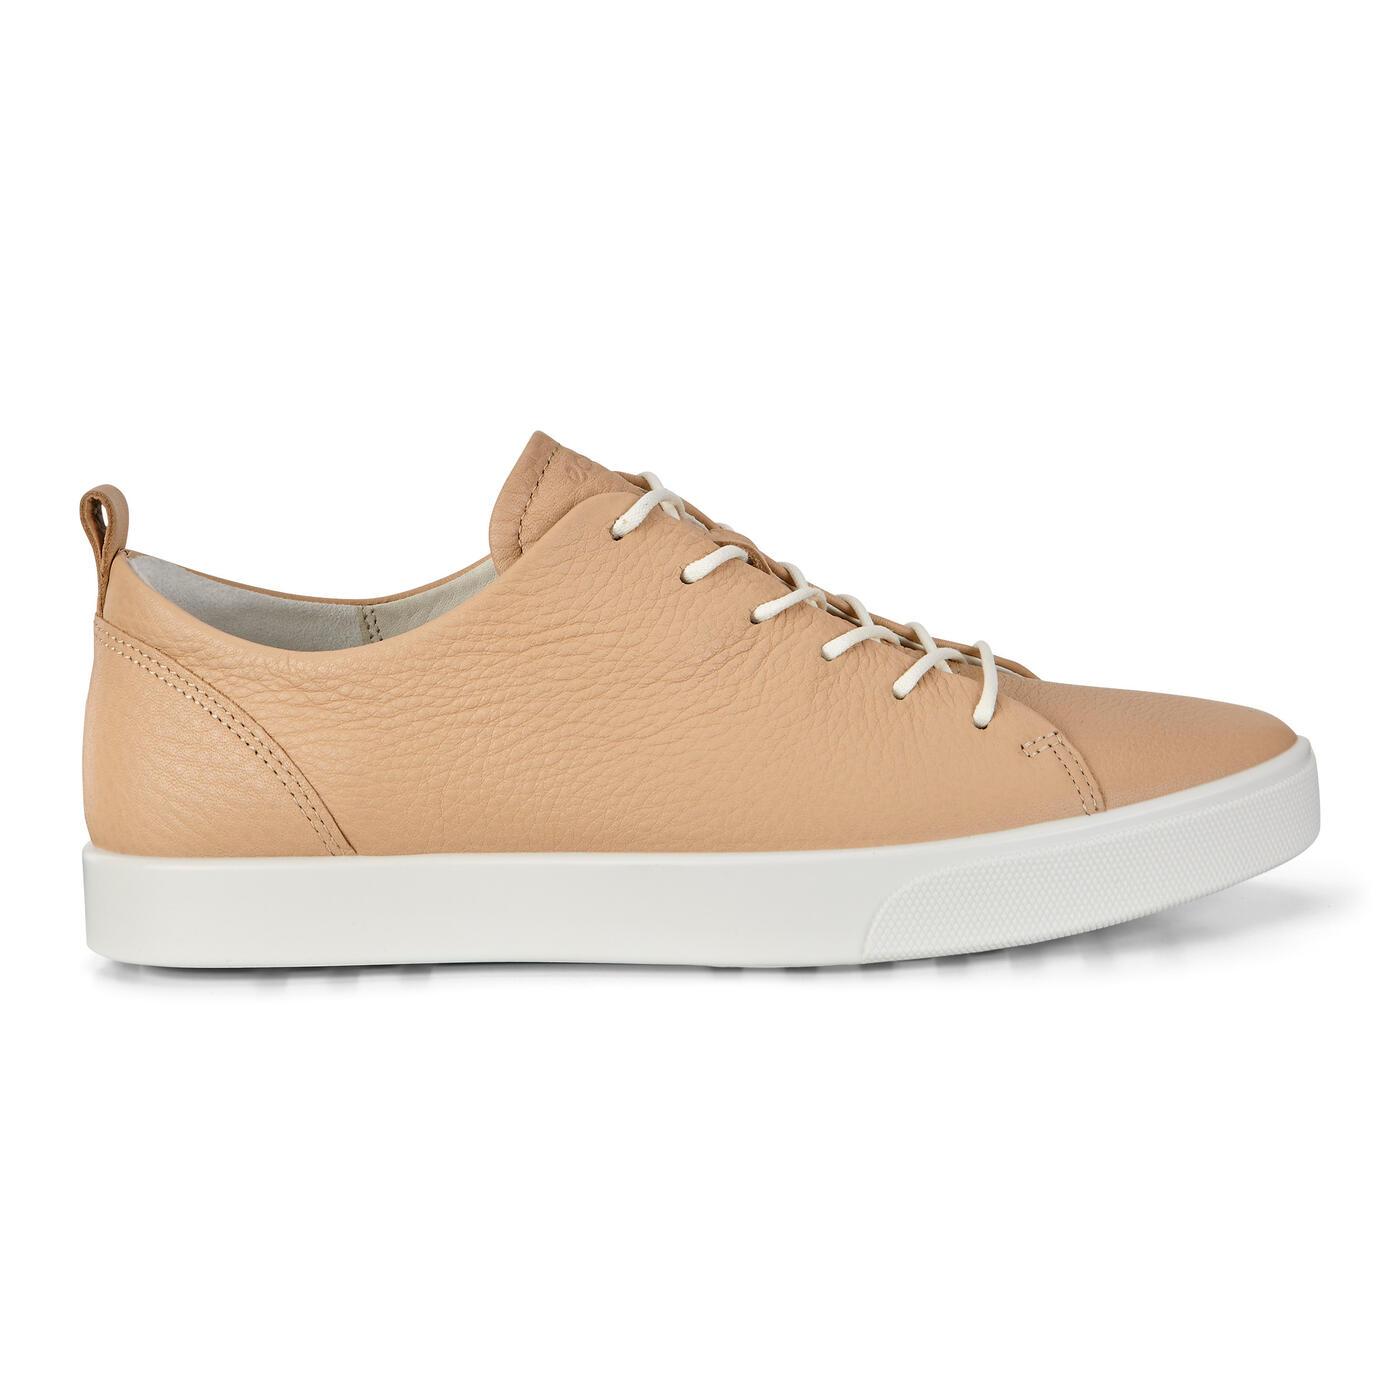 ECCO GILLIAN Sneaker Tie